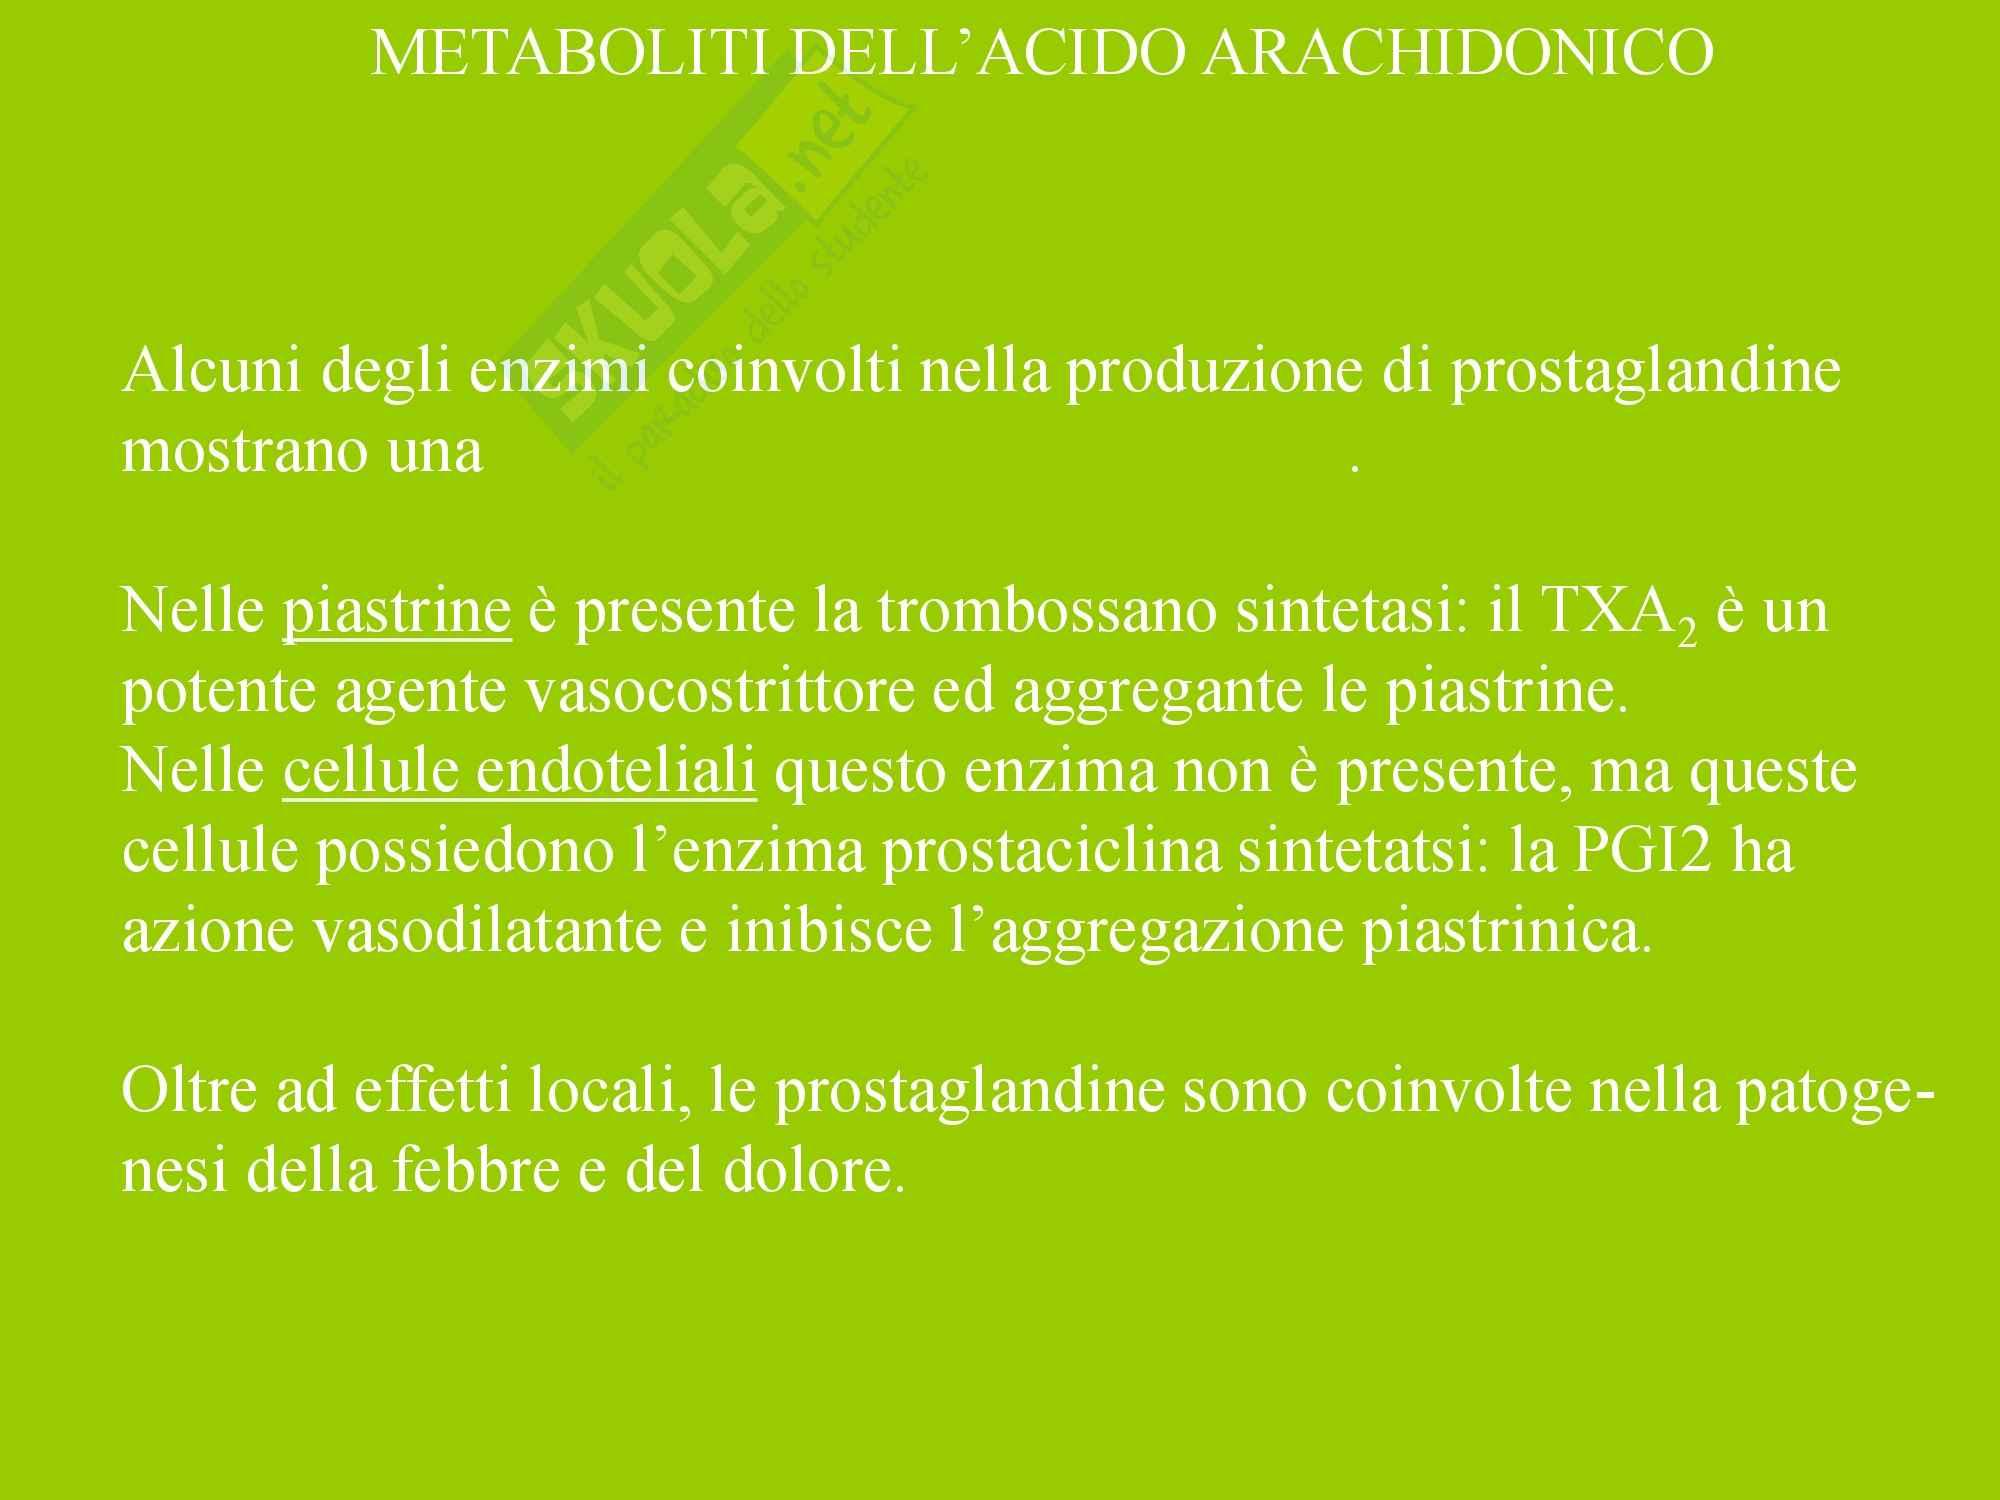 Infiammazione Acuta e Cronica Pag. 71